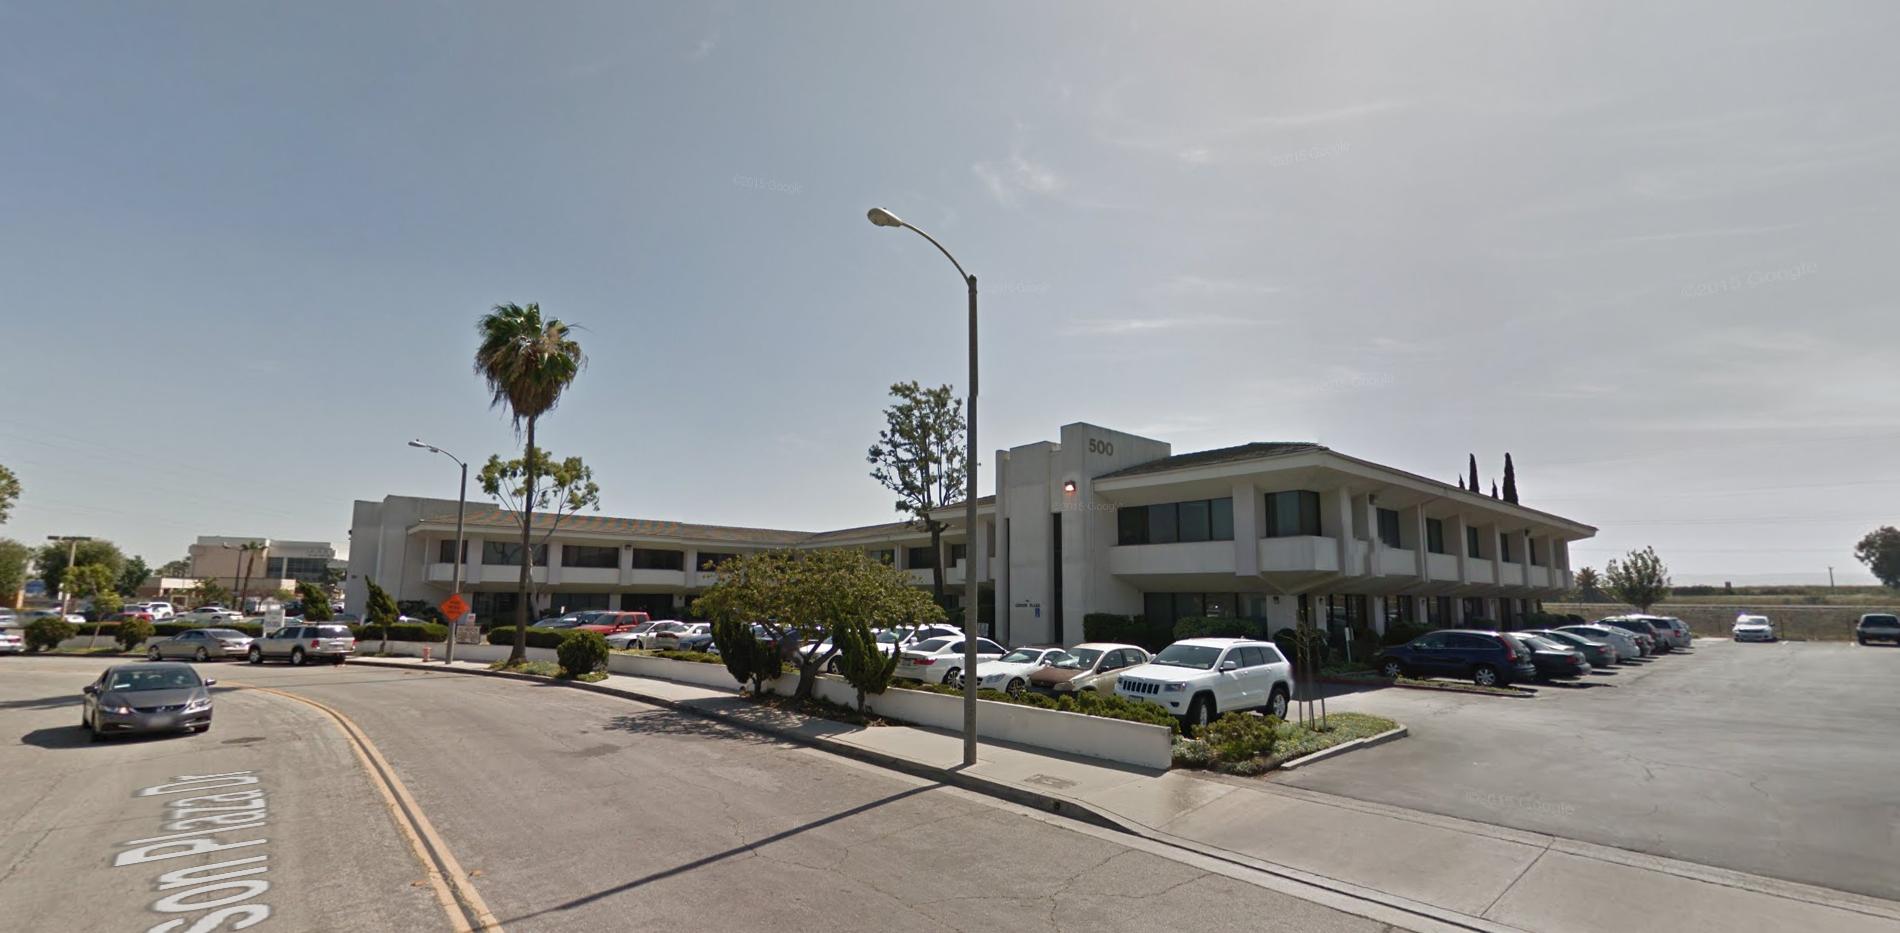 500 Carson Plaza Dr   Google Maps 2